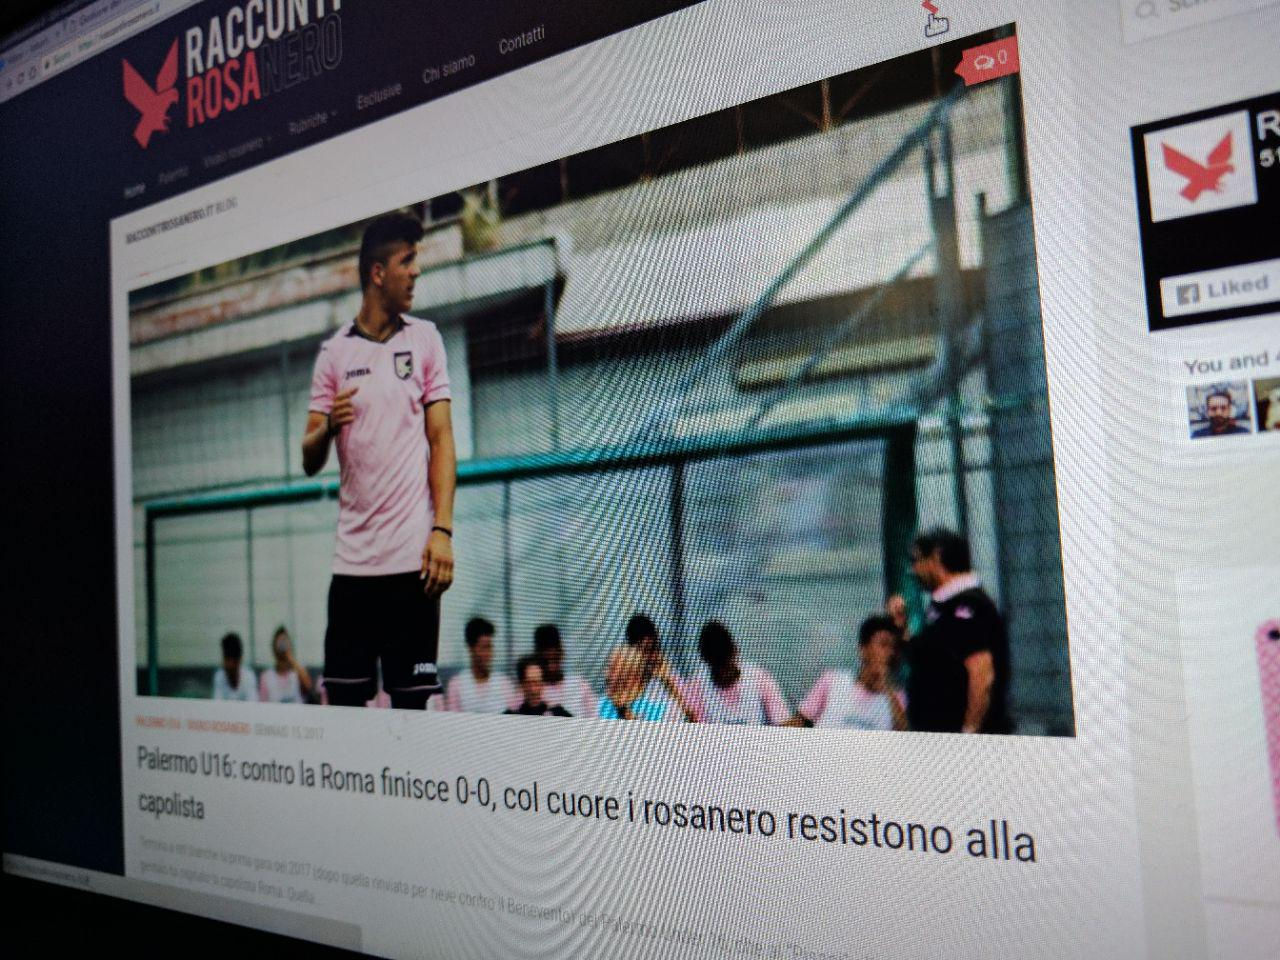 RaccontiRosanero.it è online